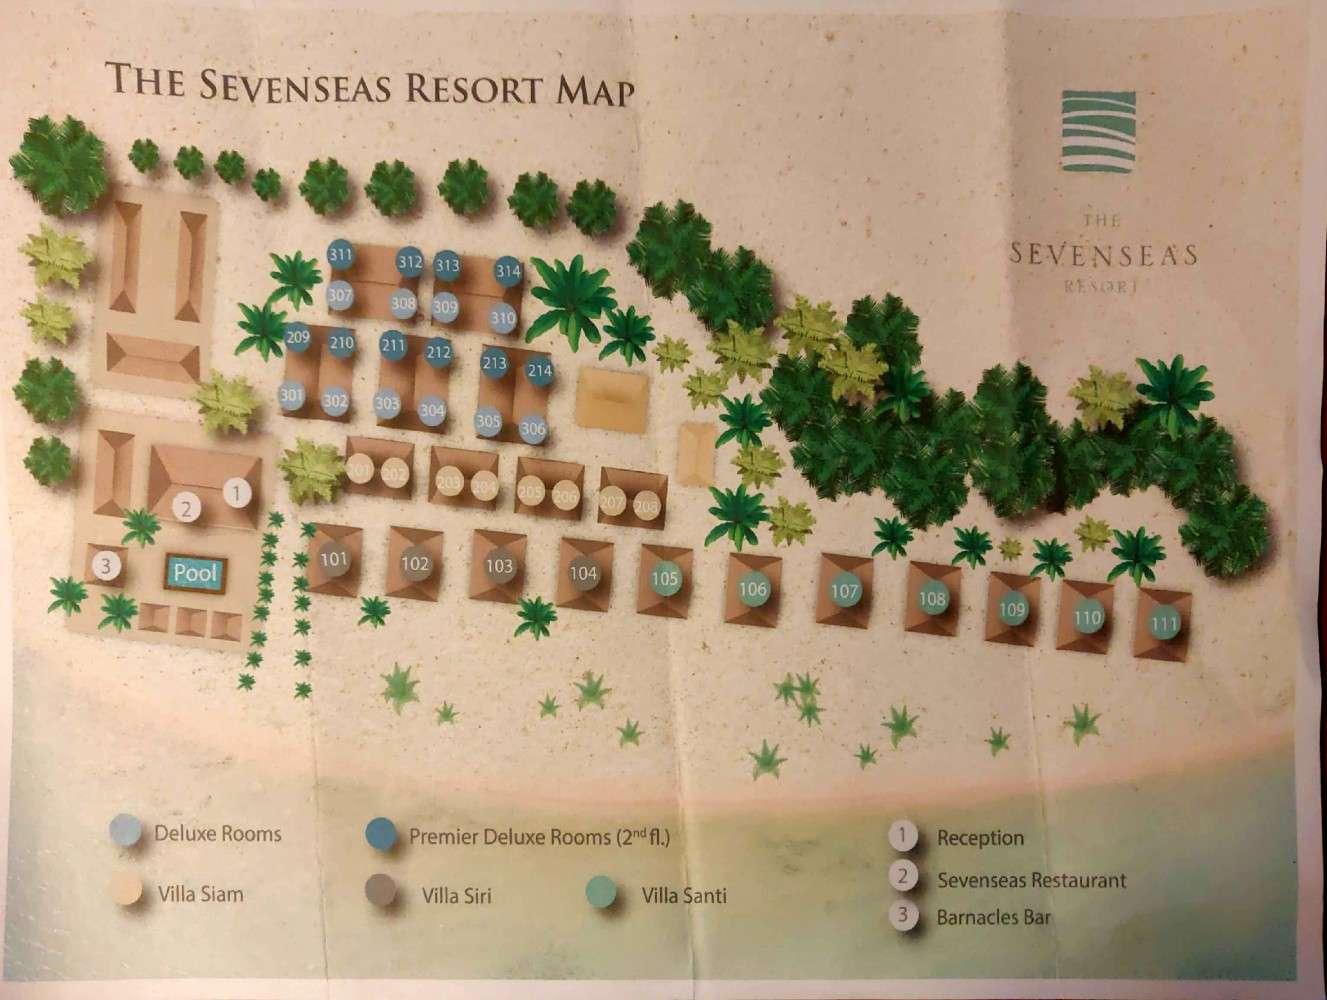 The Sevenseas Resort site plan